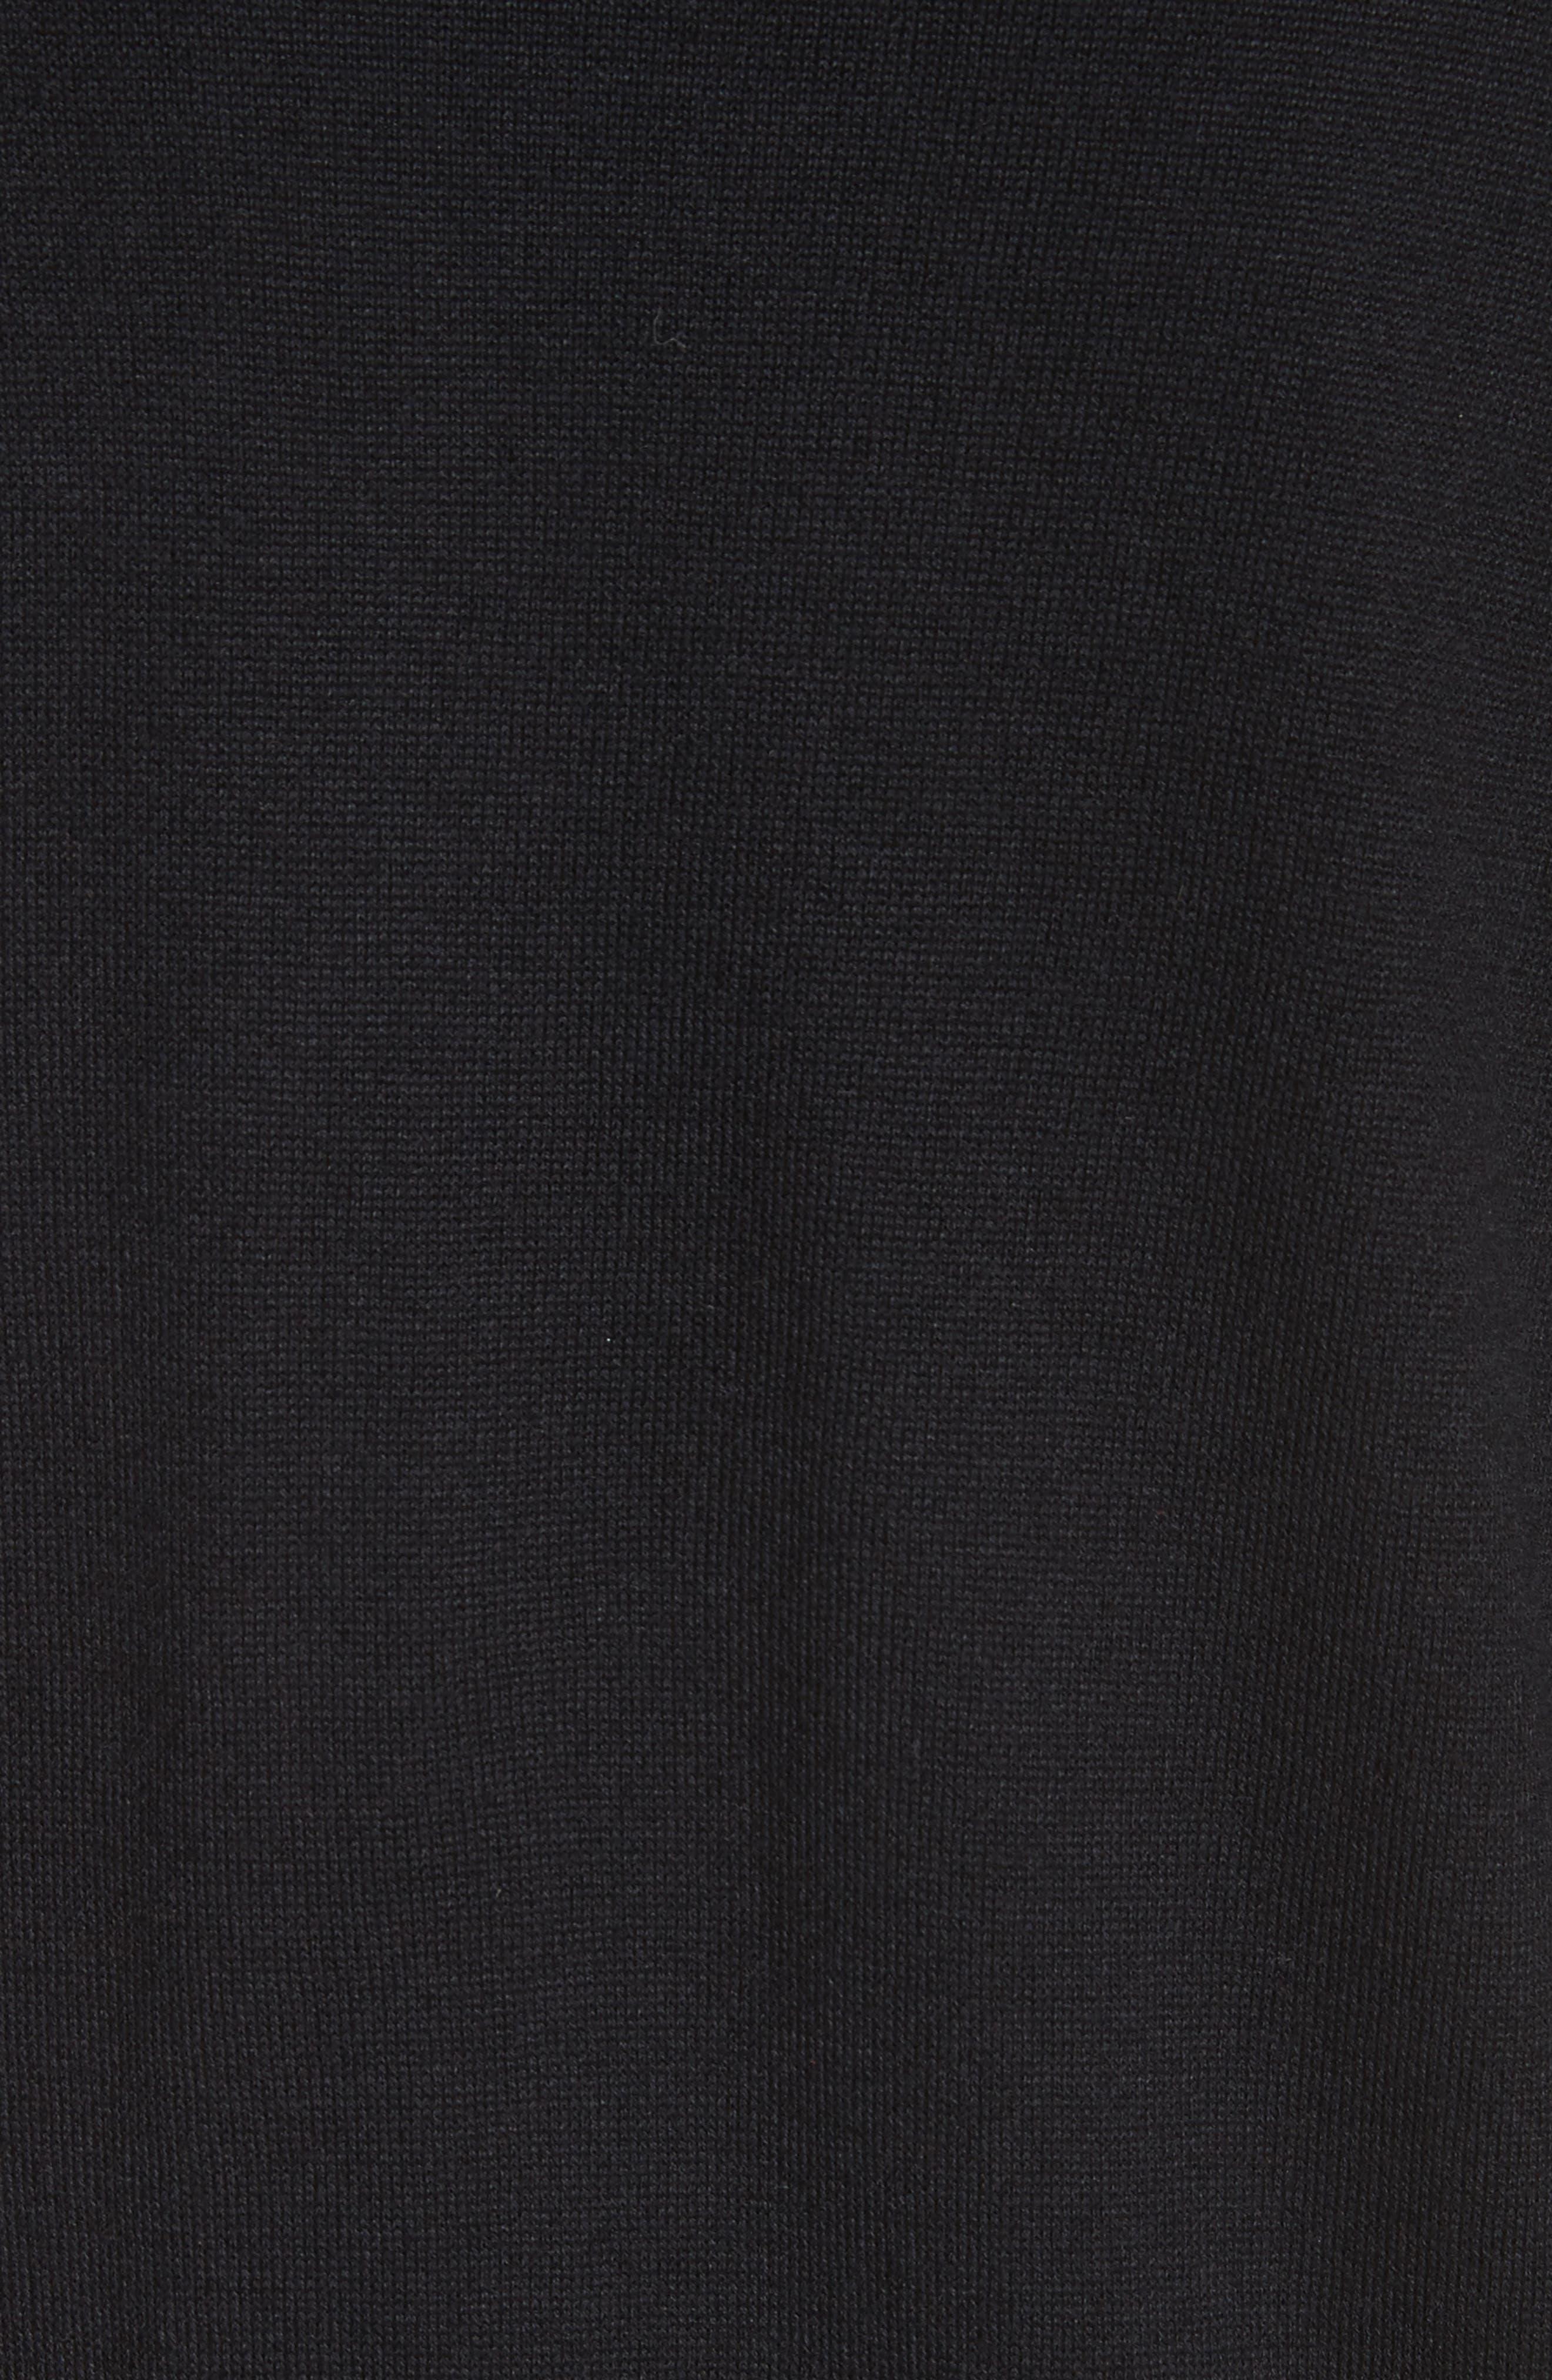 Modern Floral Hammered Satin & Jersey Knit Cardigan,                             Alternate thumbnail 6, color,                             Caviar Multi